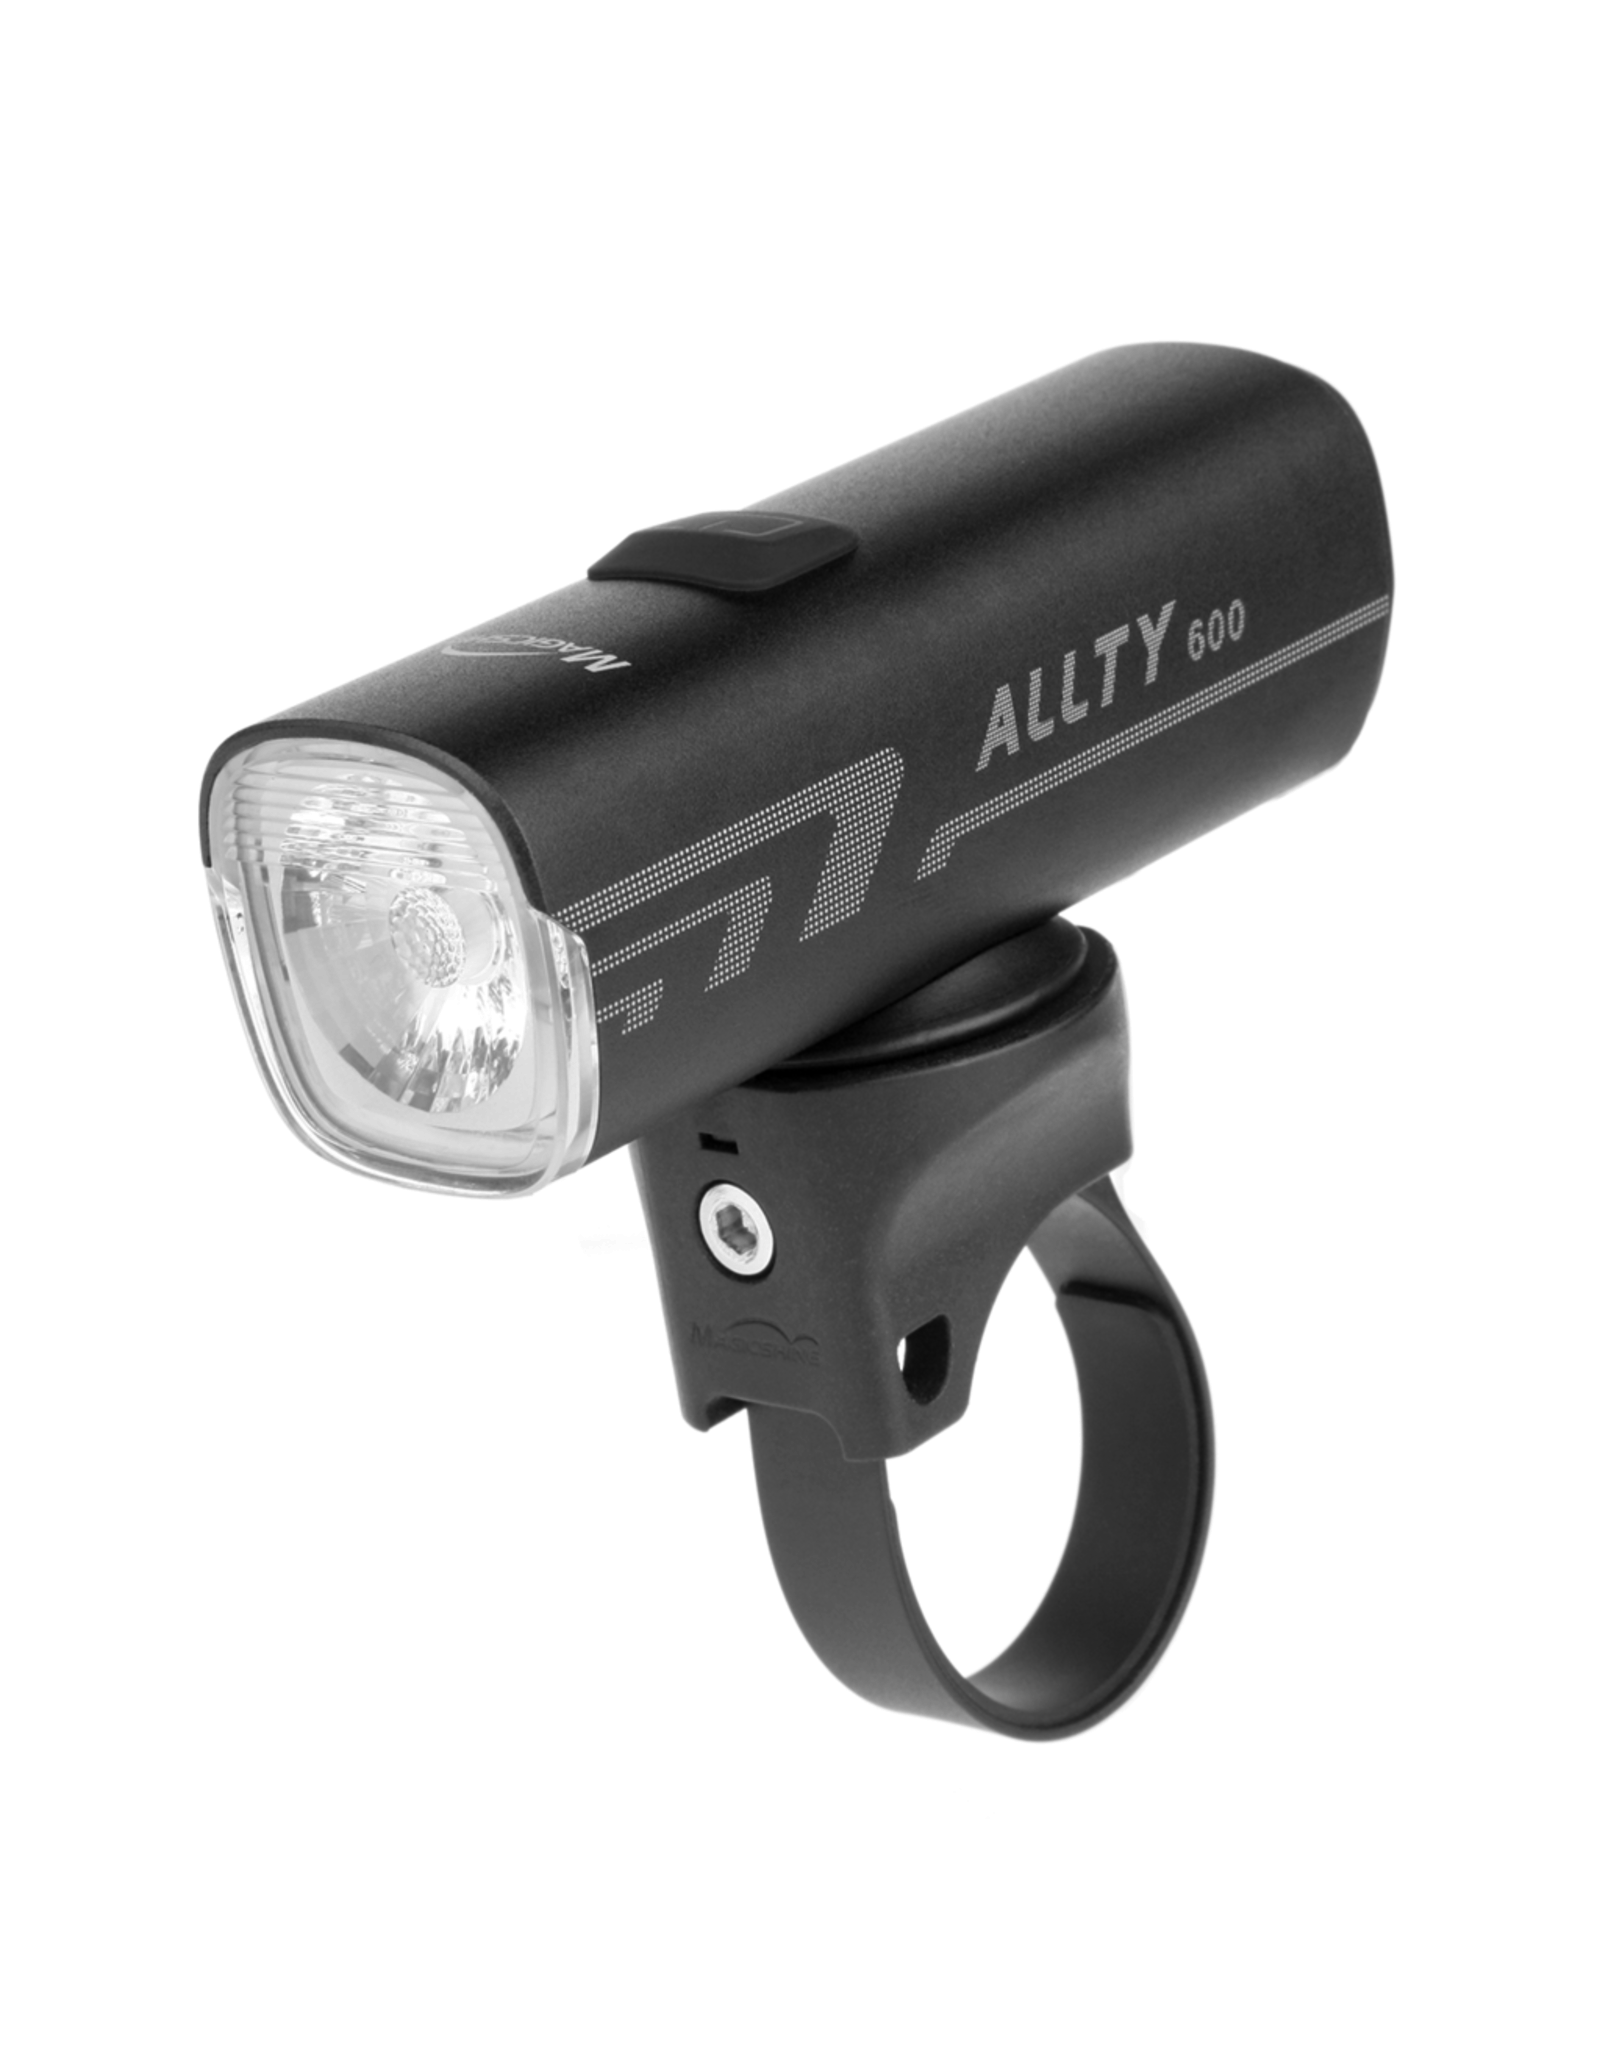 MagicShine Allty 600 Front Light